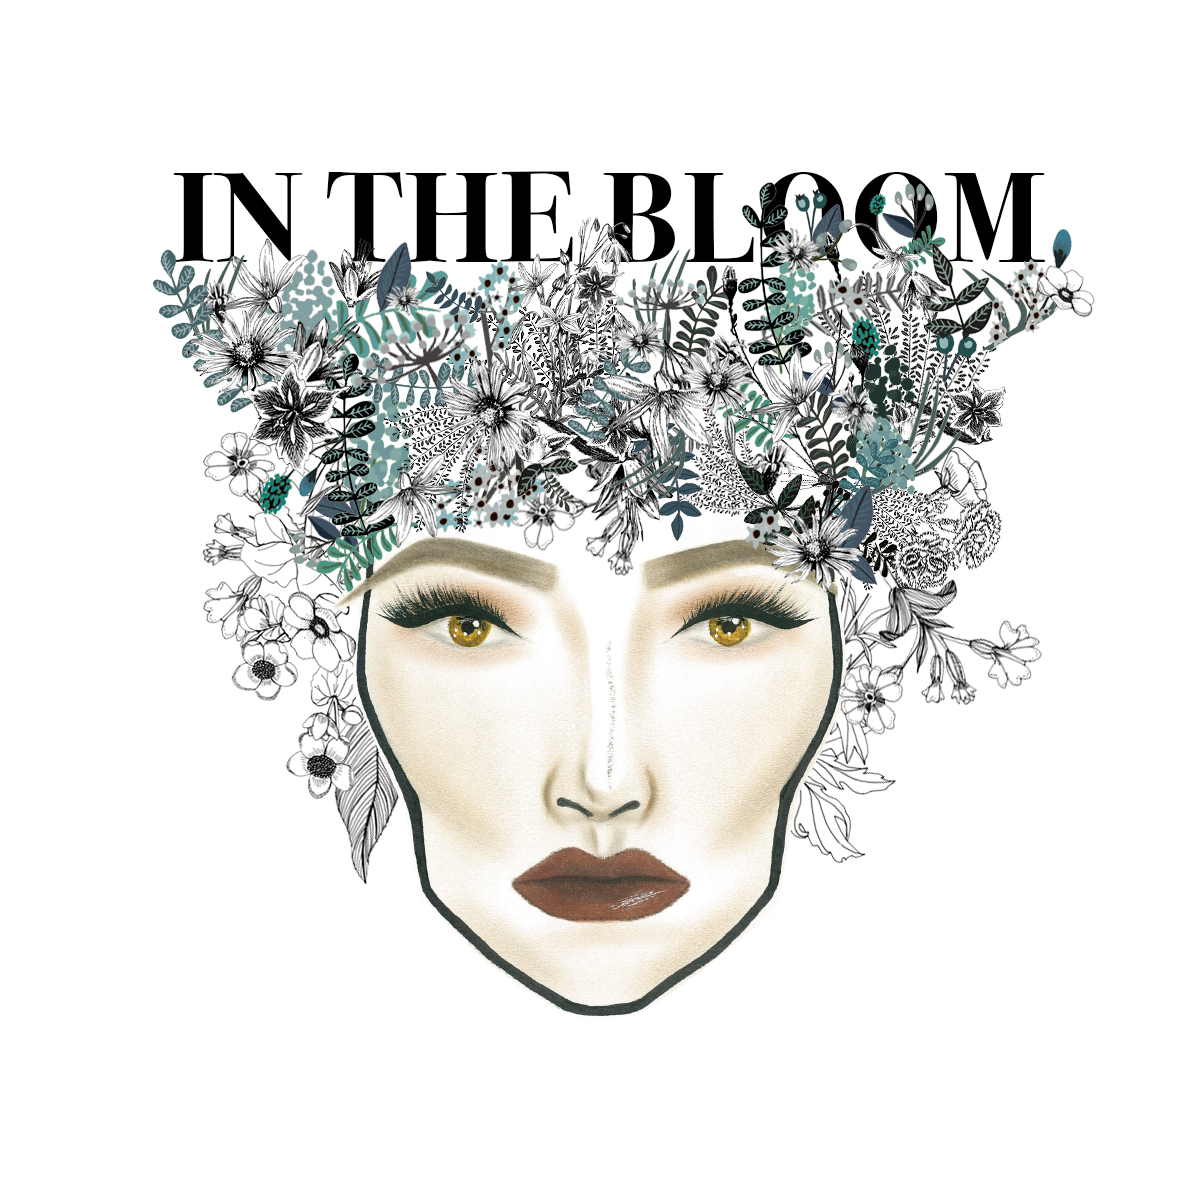 In-the-bloom-blog-profile-pic.jpg